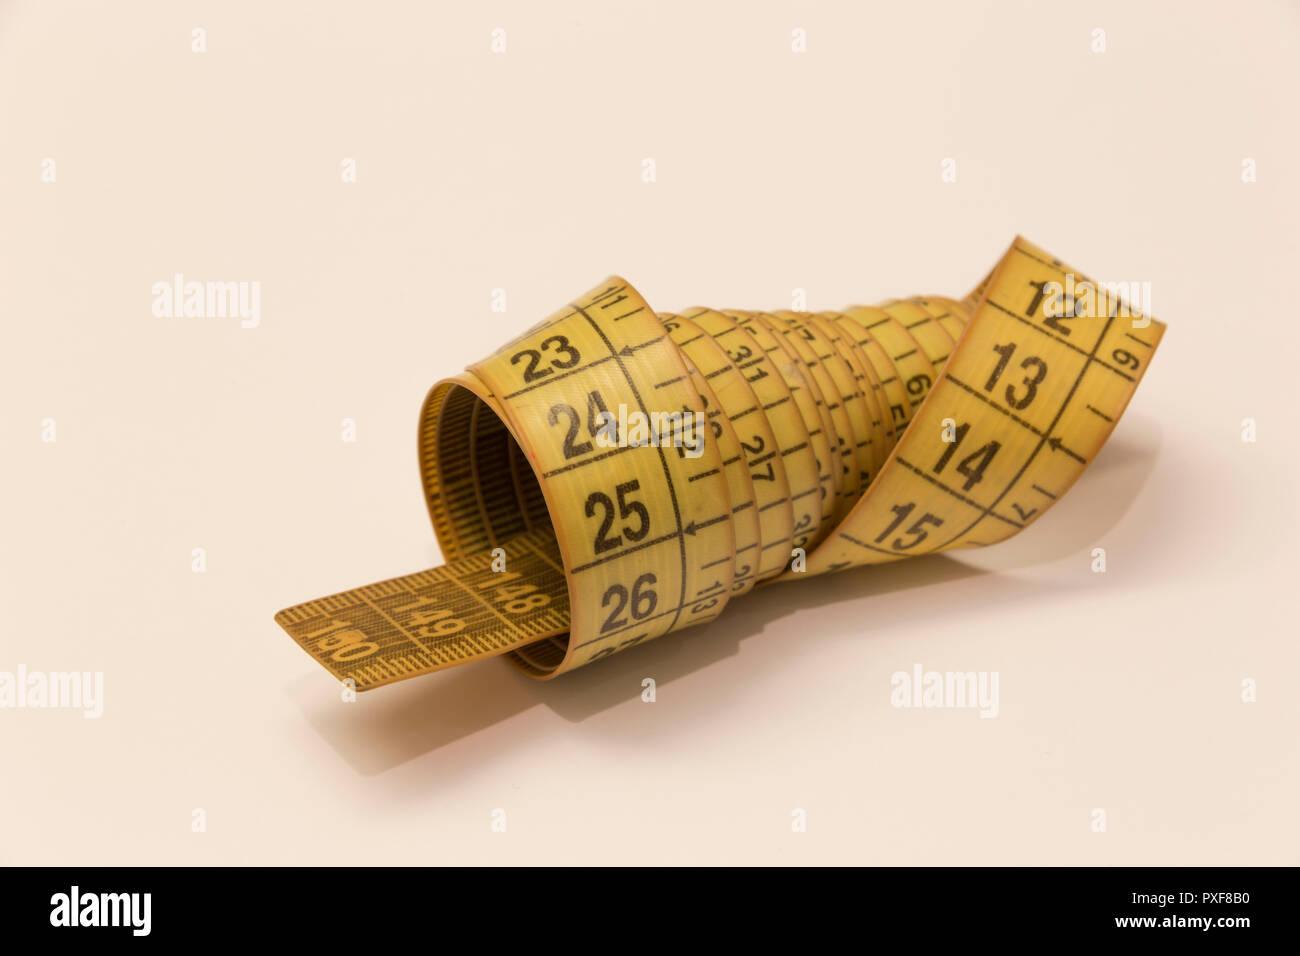 close up tape measure - Stock Image